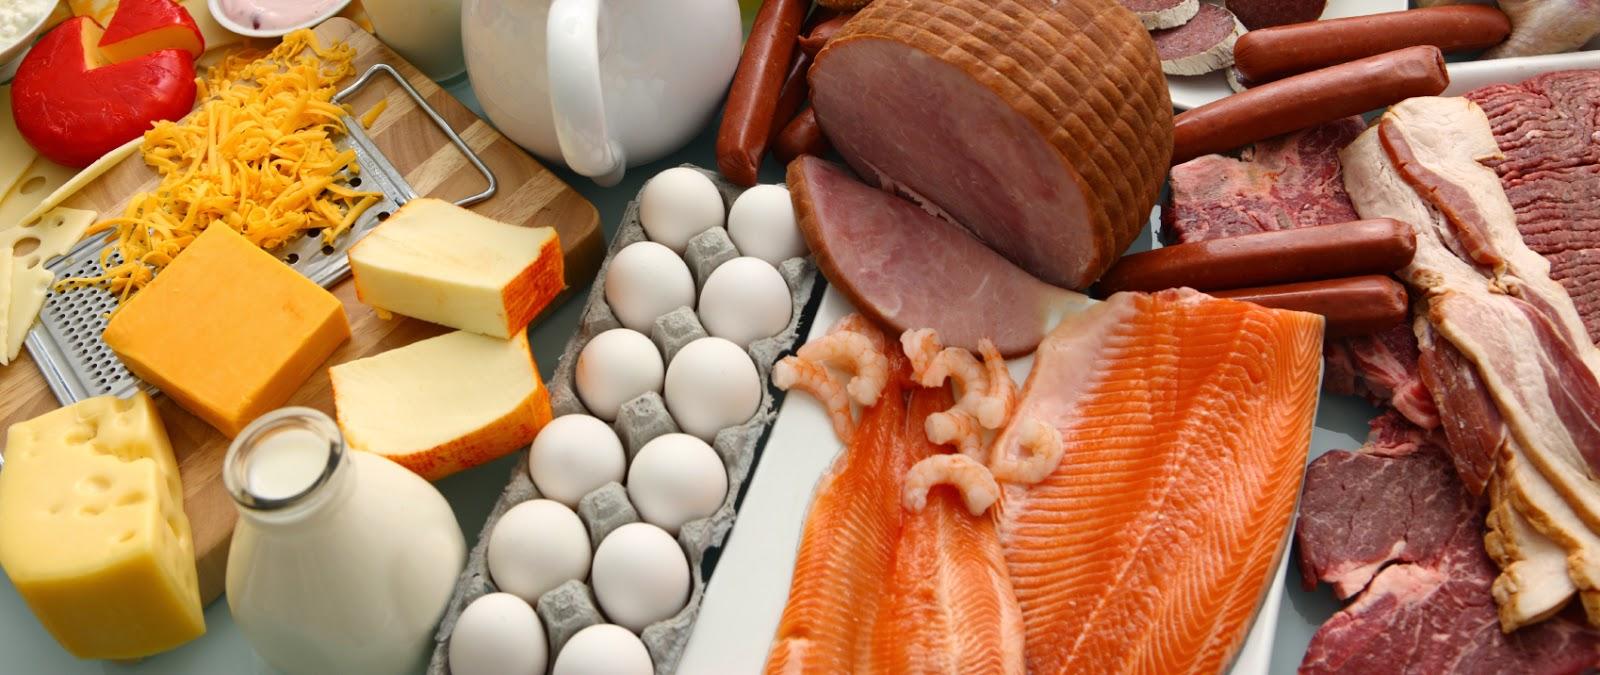 Диета Дюкана: Белки, белки и ... еще раз белки!